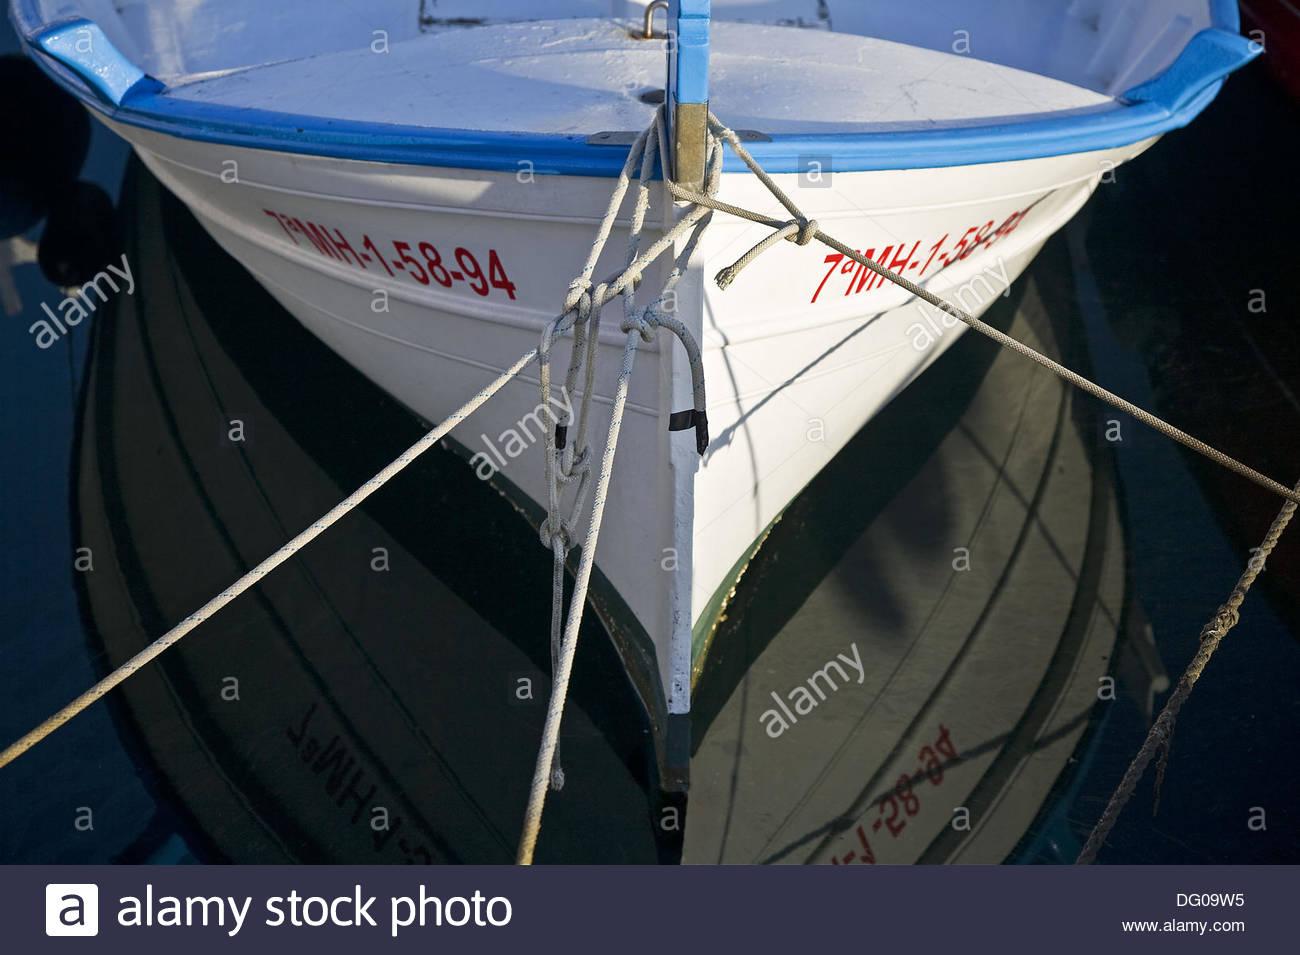 Catboat Stock Photos & Catboat Stock Images - Alamy